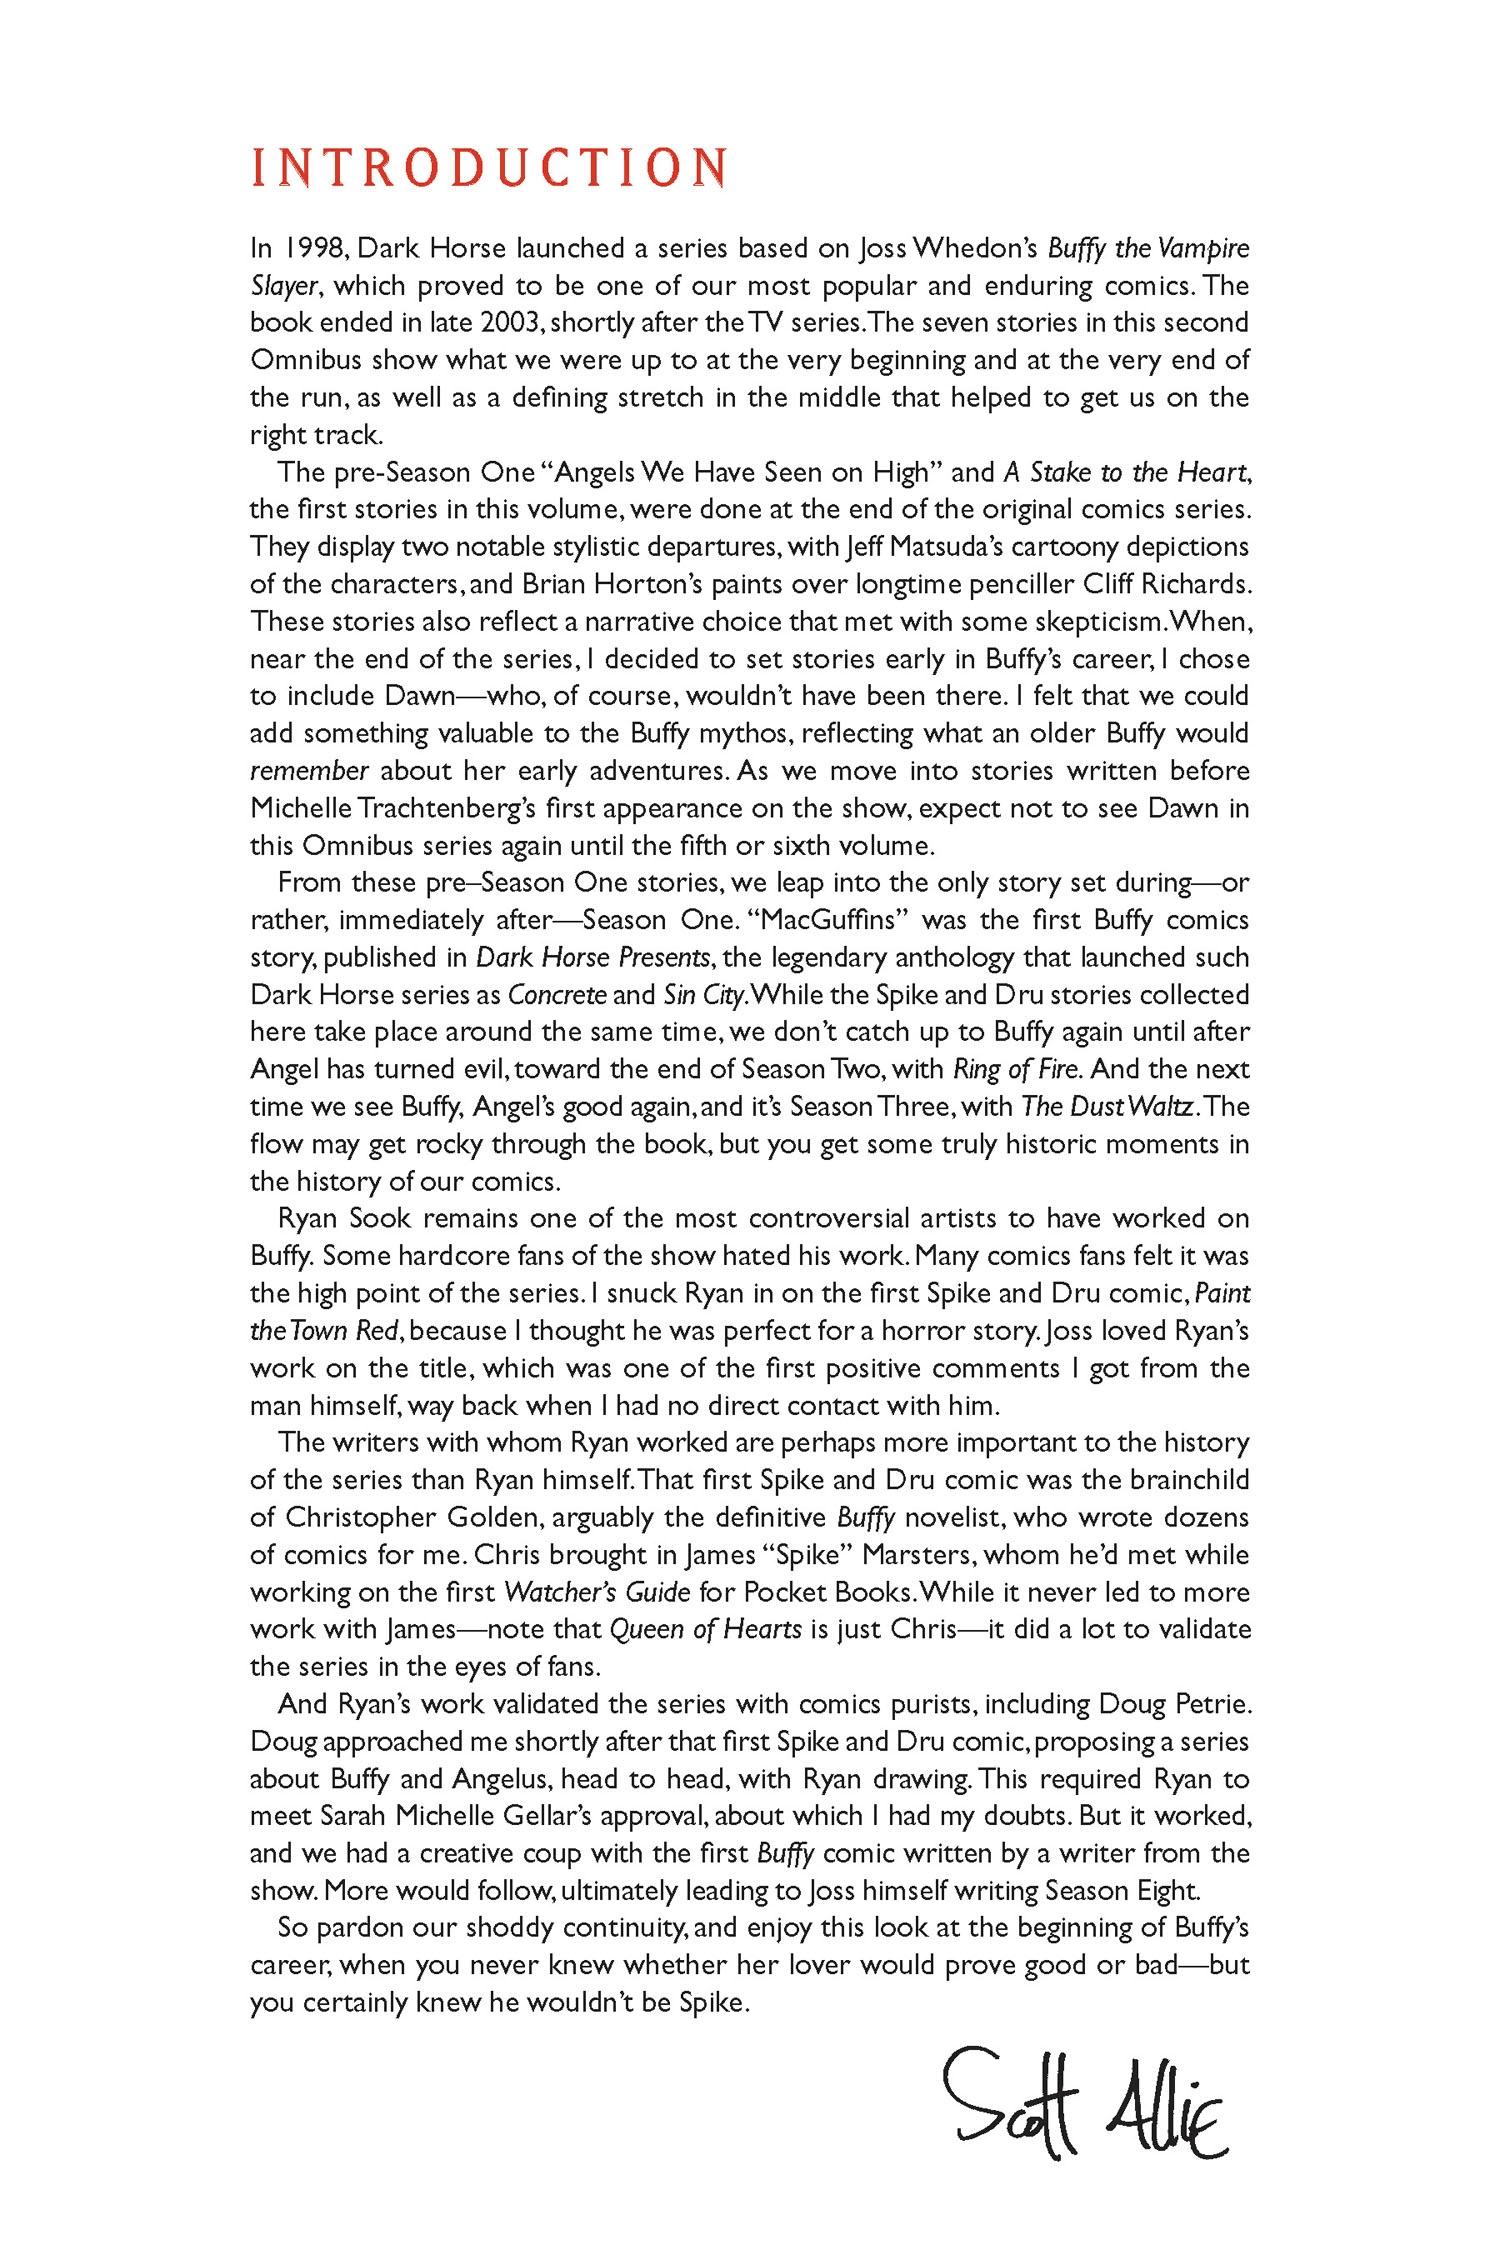 Read online Buffy the Vampire Slayer: Omnibus comic -  Issue # TPB 2 - 6